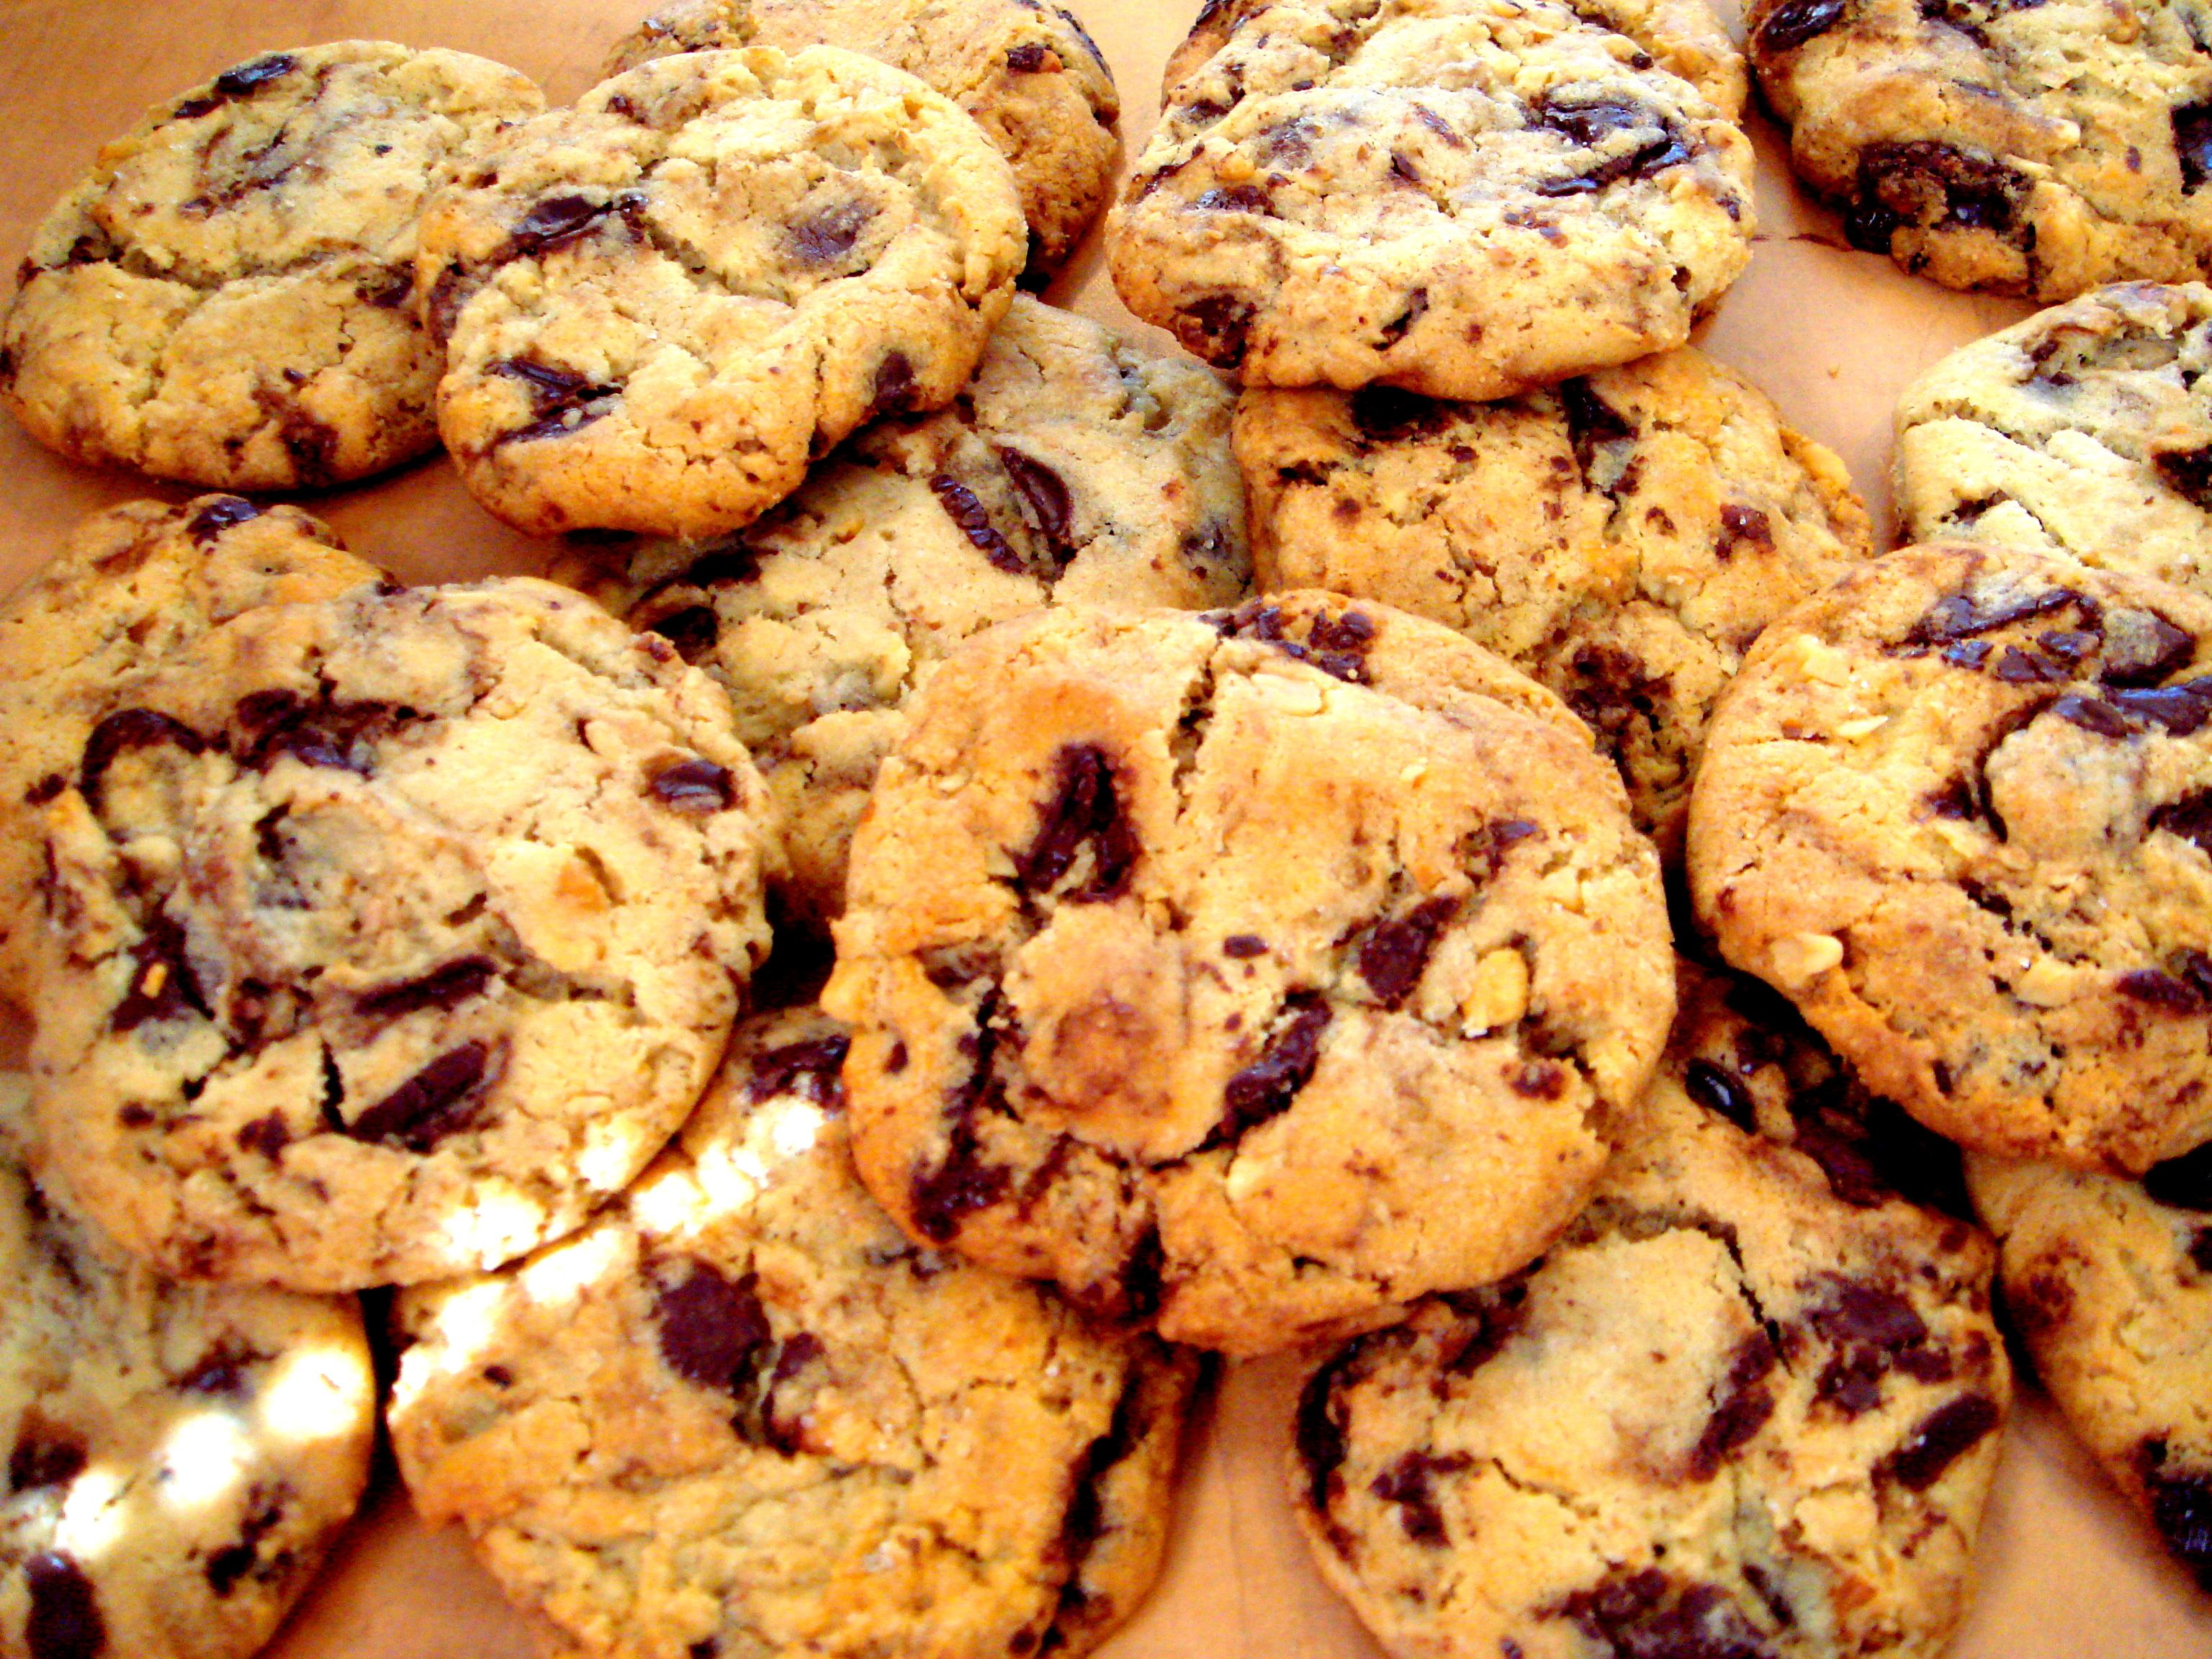 Best Crunchy Chocolate Chip Cookie Recipe